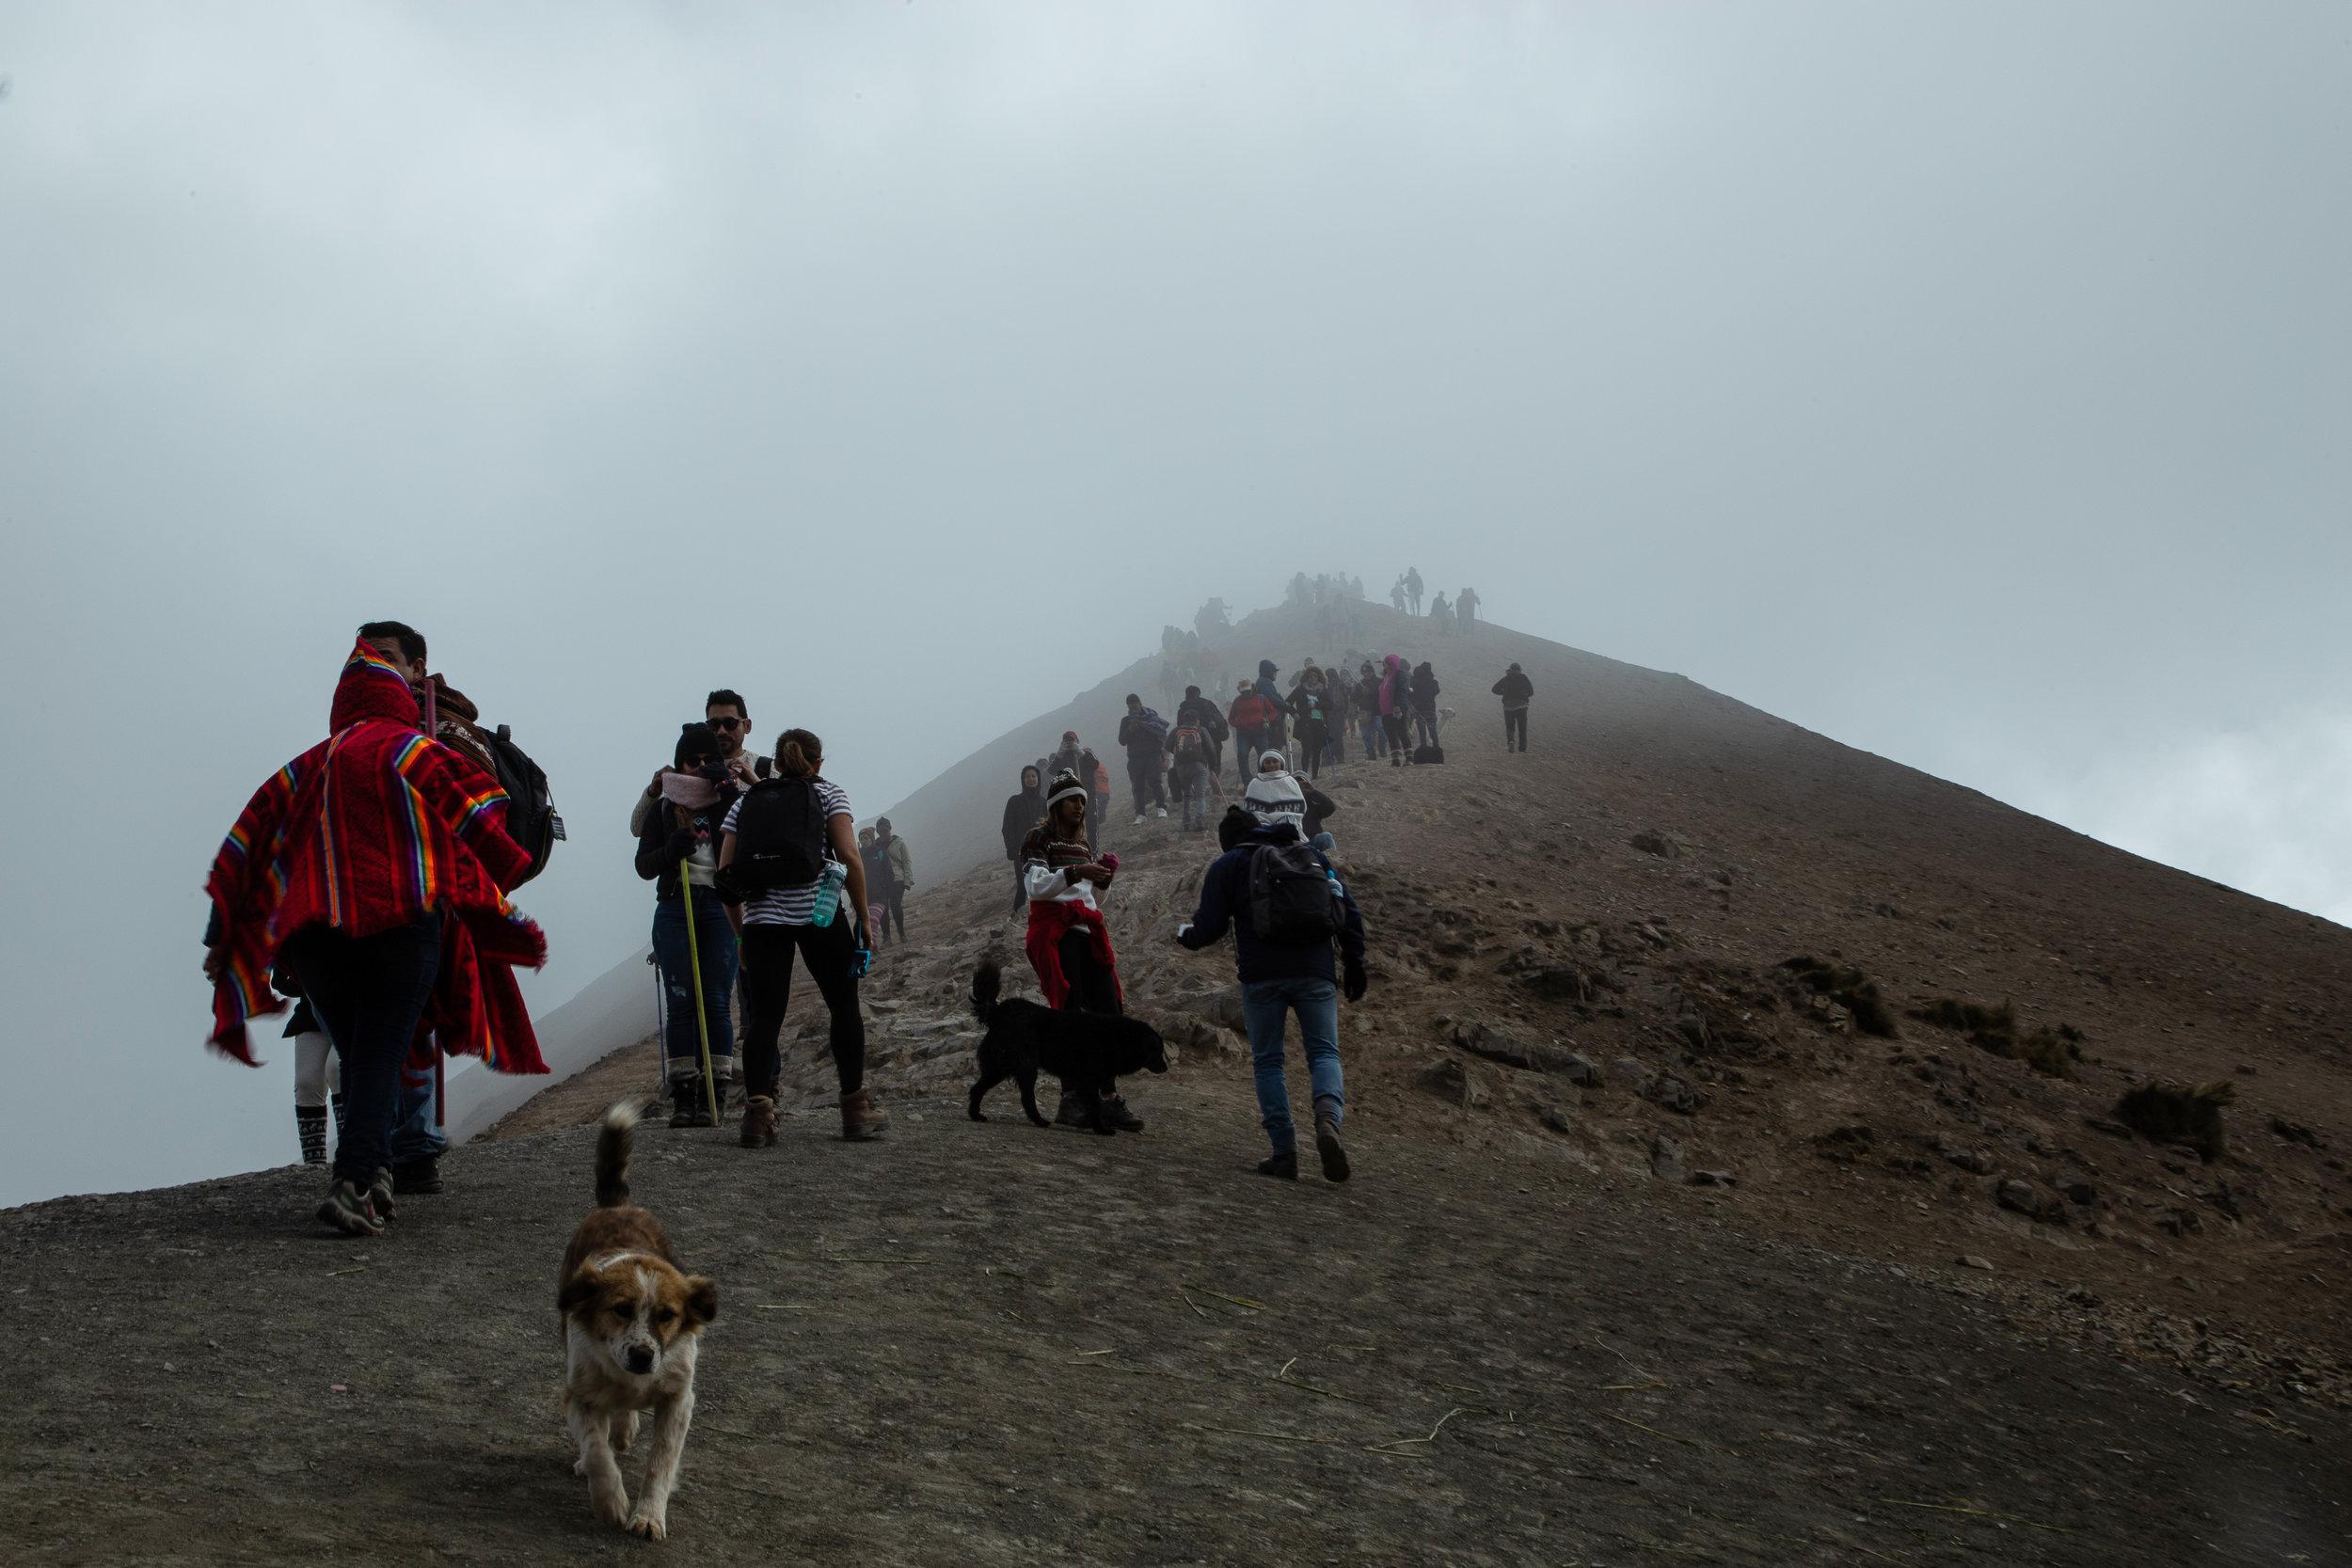 Into the clouds - Rainbow Mountain, Cusco Region